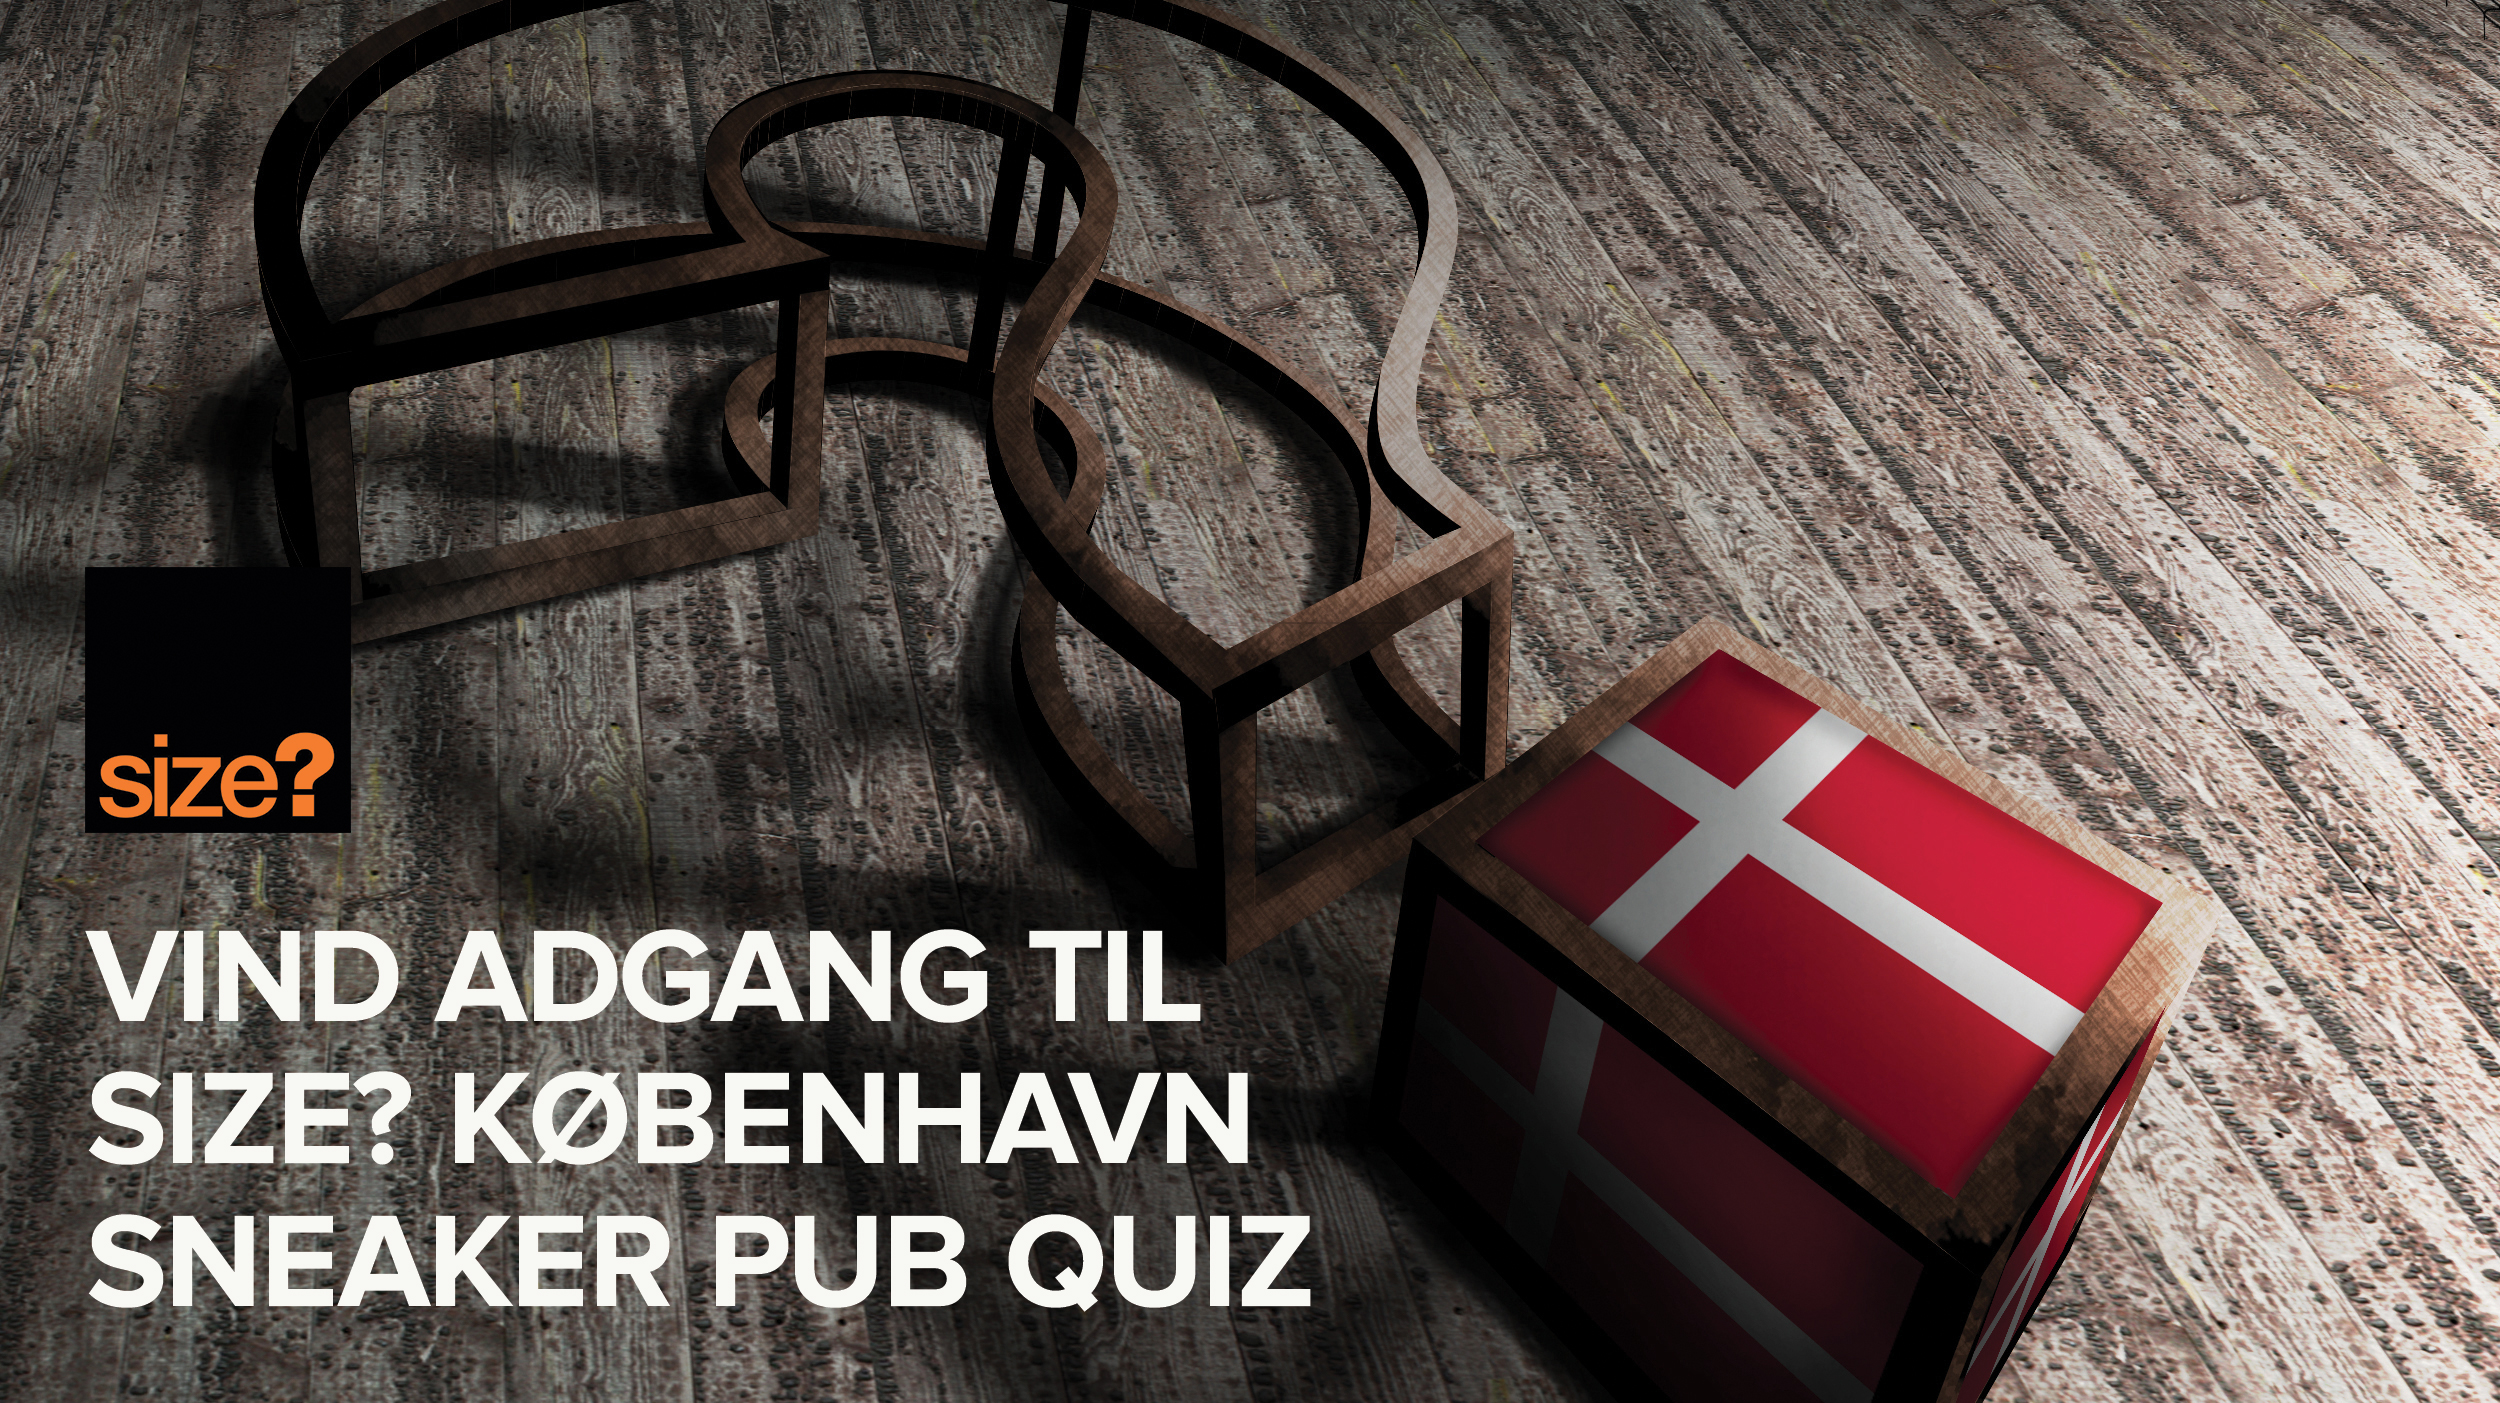 size? Copenhagen Sneaker Pub Quiz.